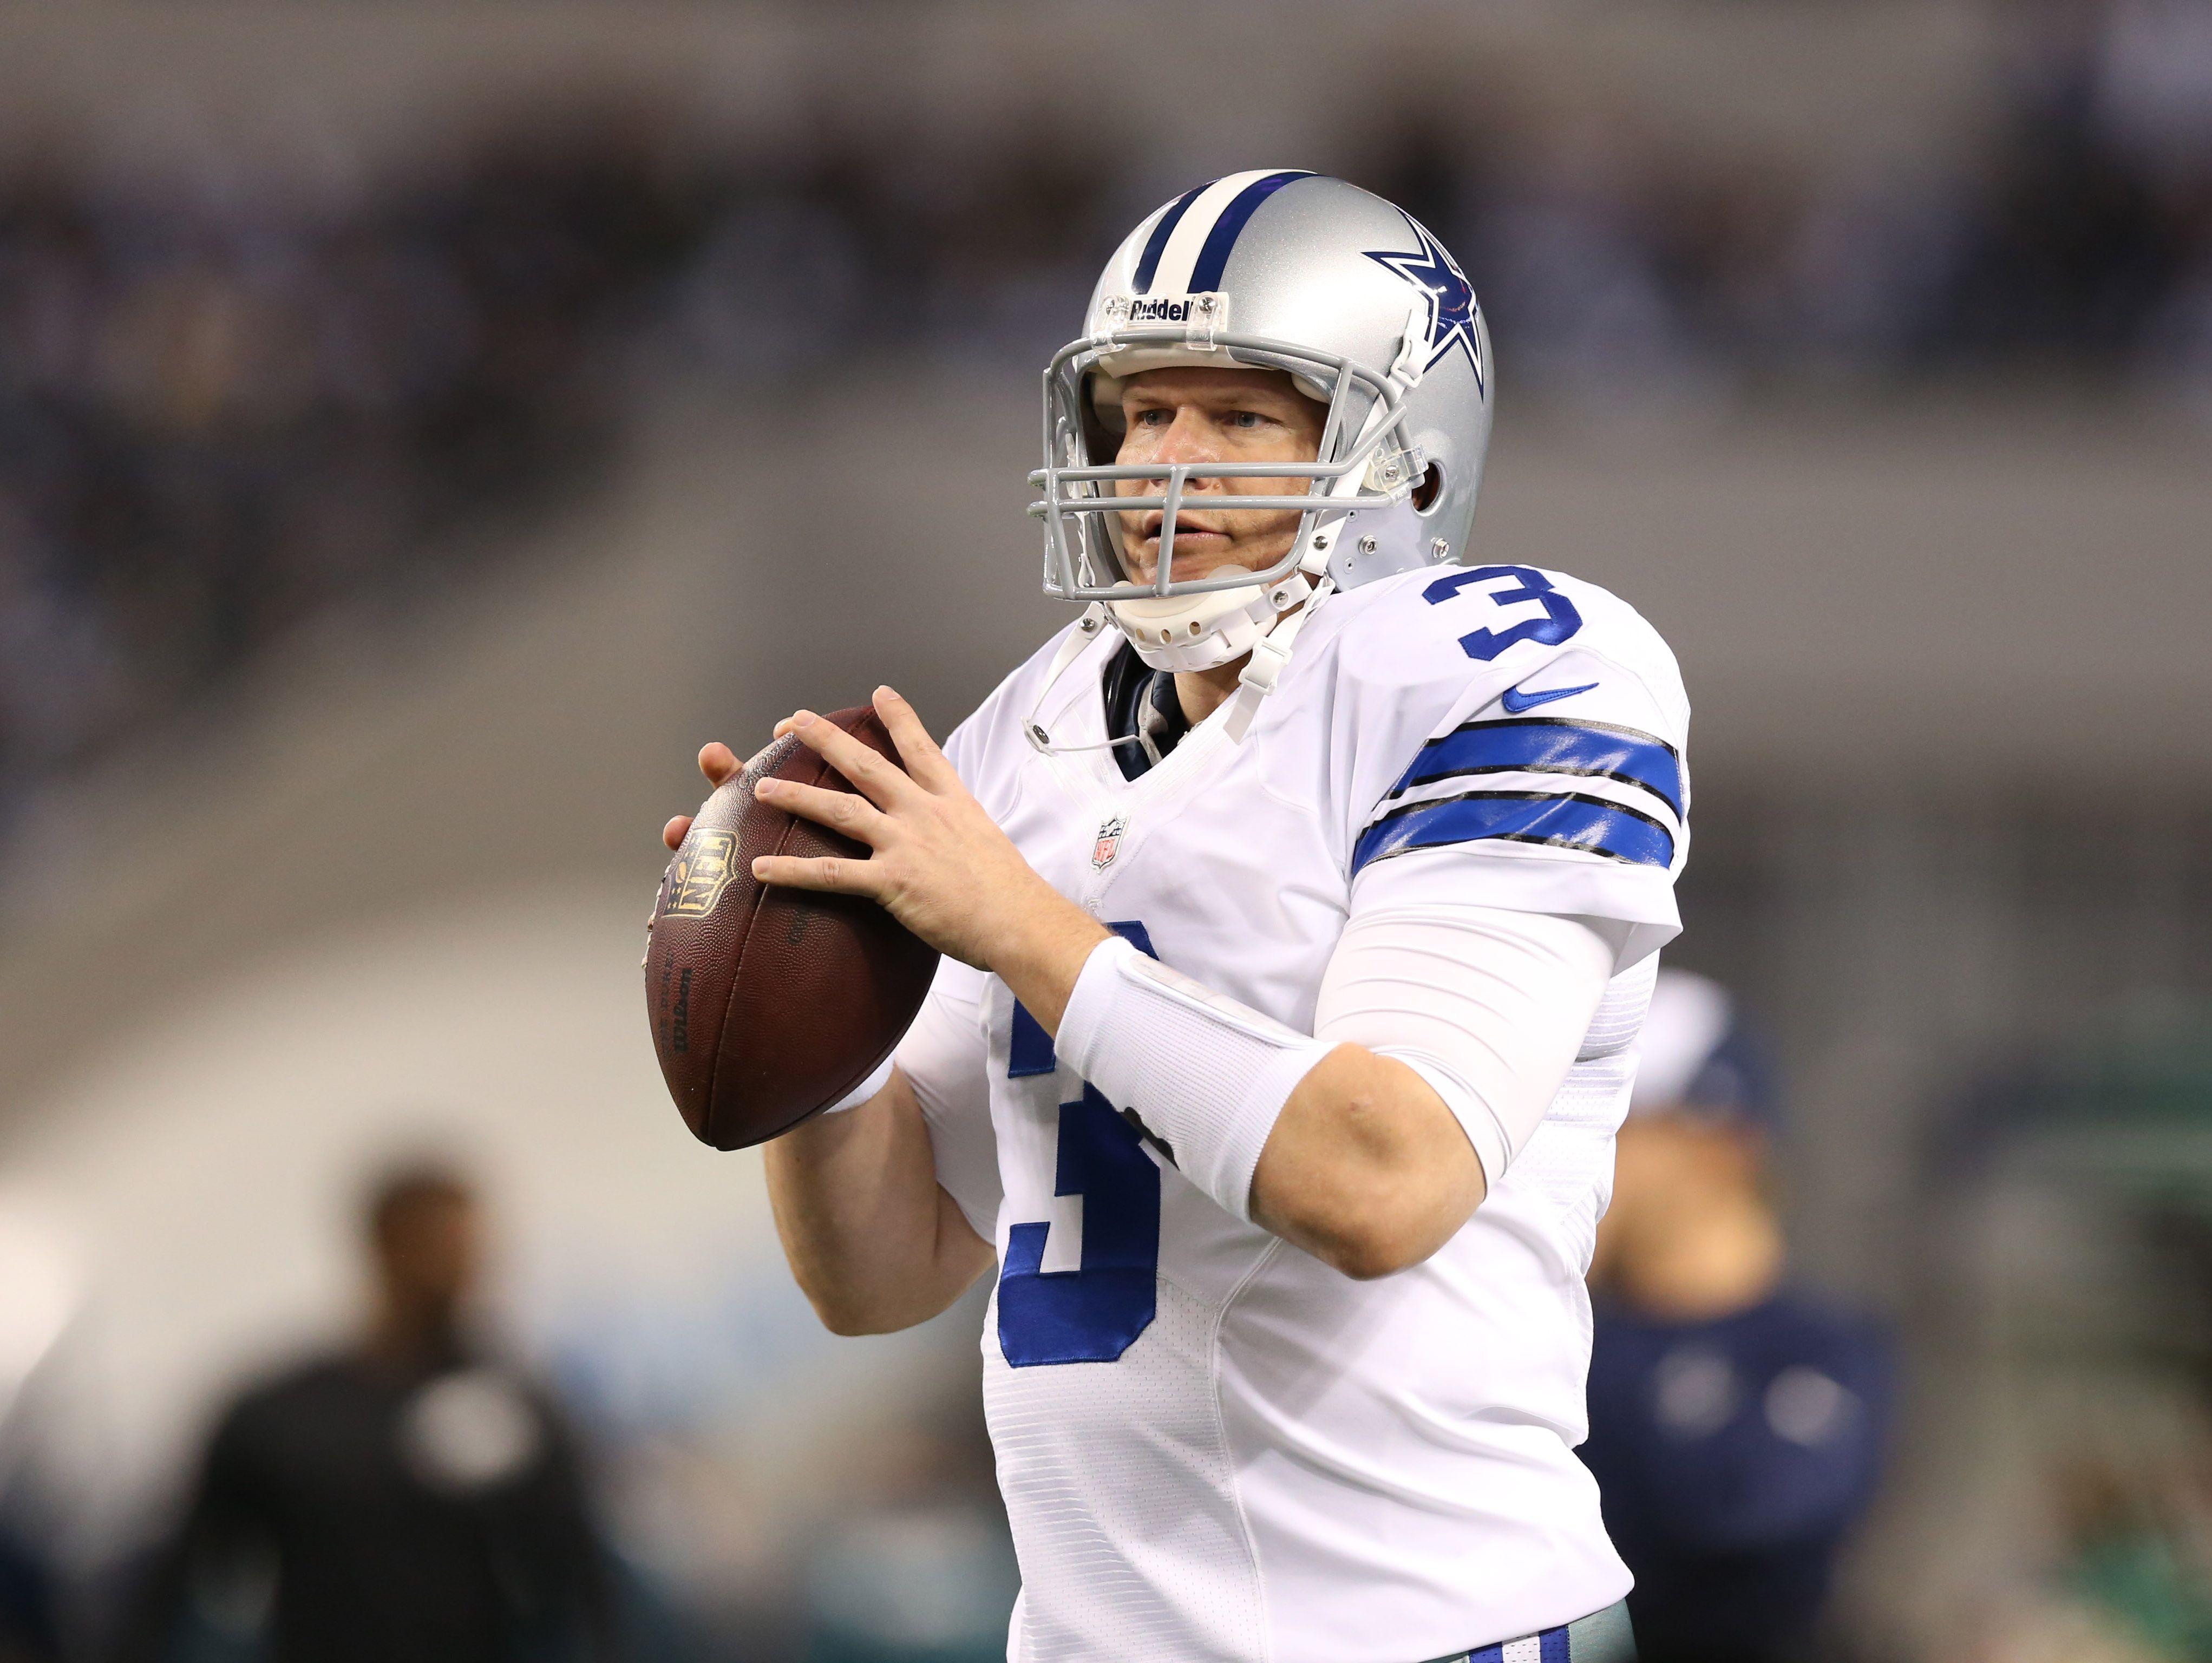 Former Cowboys quarterback and Lincoln football coach Jon Kitna headed back to Texas to coach at Waxahachie High School next year.